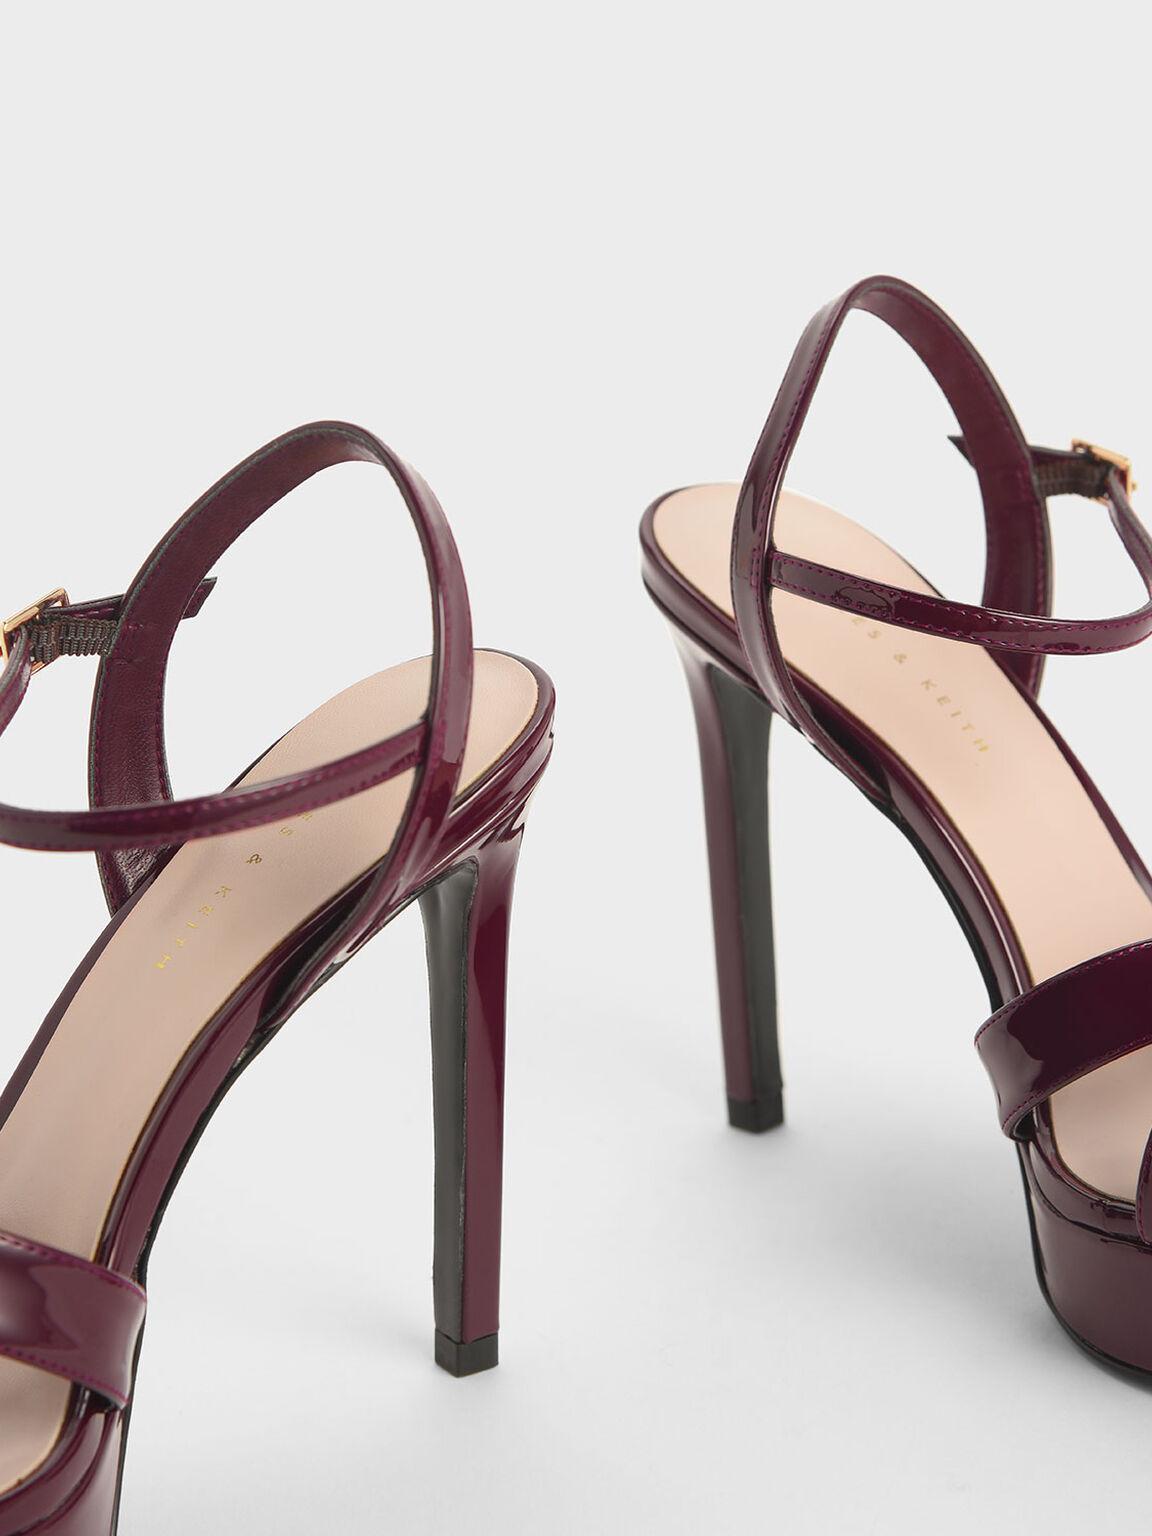 Criss Cross Ankle Strap Patent Platform Heels, Burgundy, hi-res